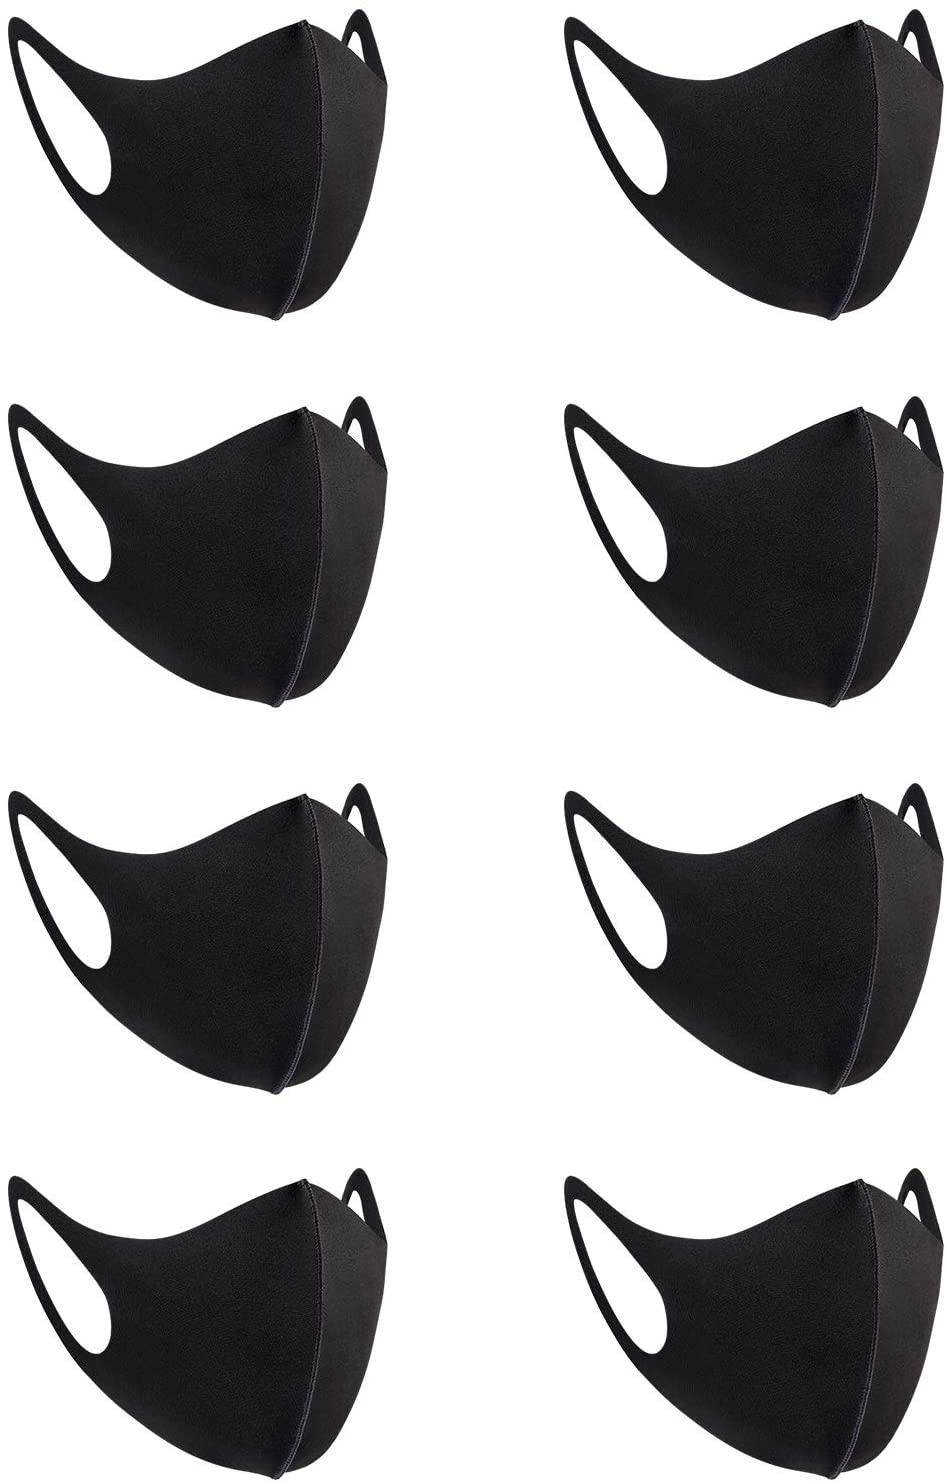 8 Pack Fashion Cloth Fabric Face Protection, Unisex Earloop Bandana Balaclava Washable, Reusable Mask